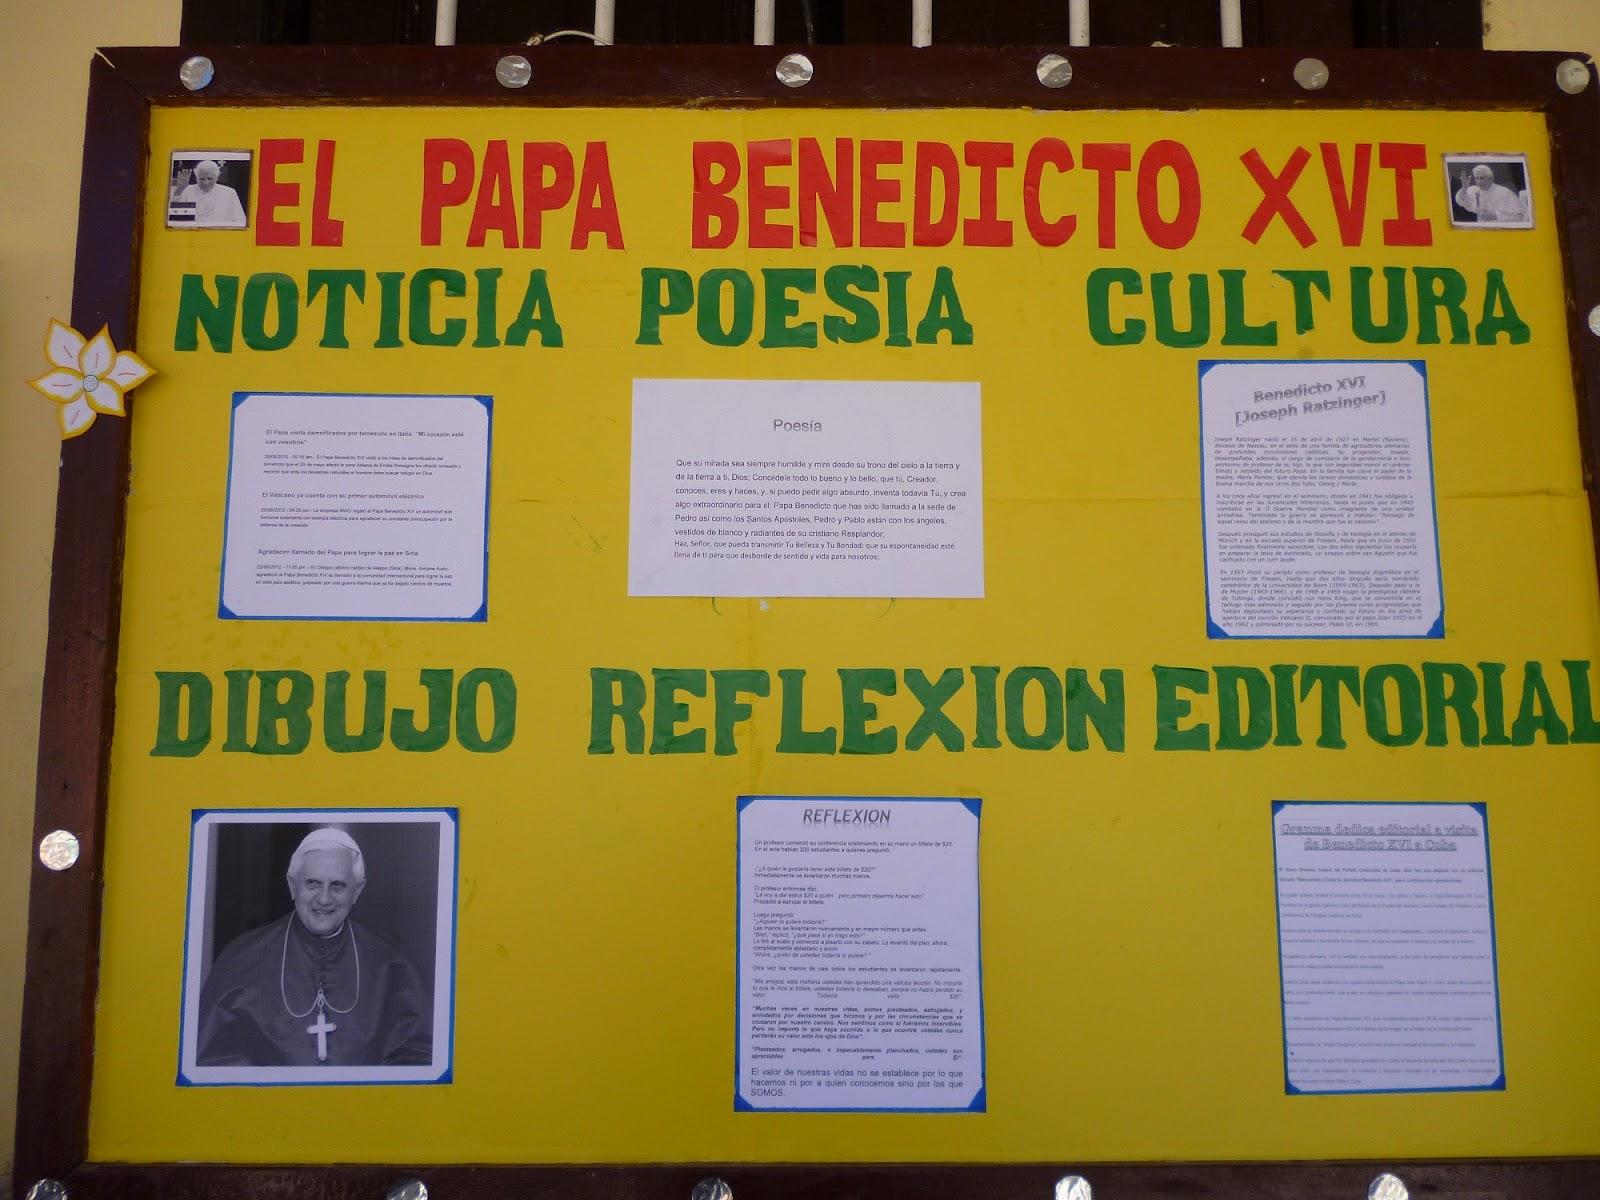 Peri dicos murales en honor al papa benedicto xvi for El periodico mural wikipedia